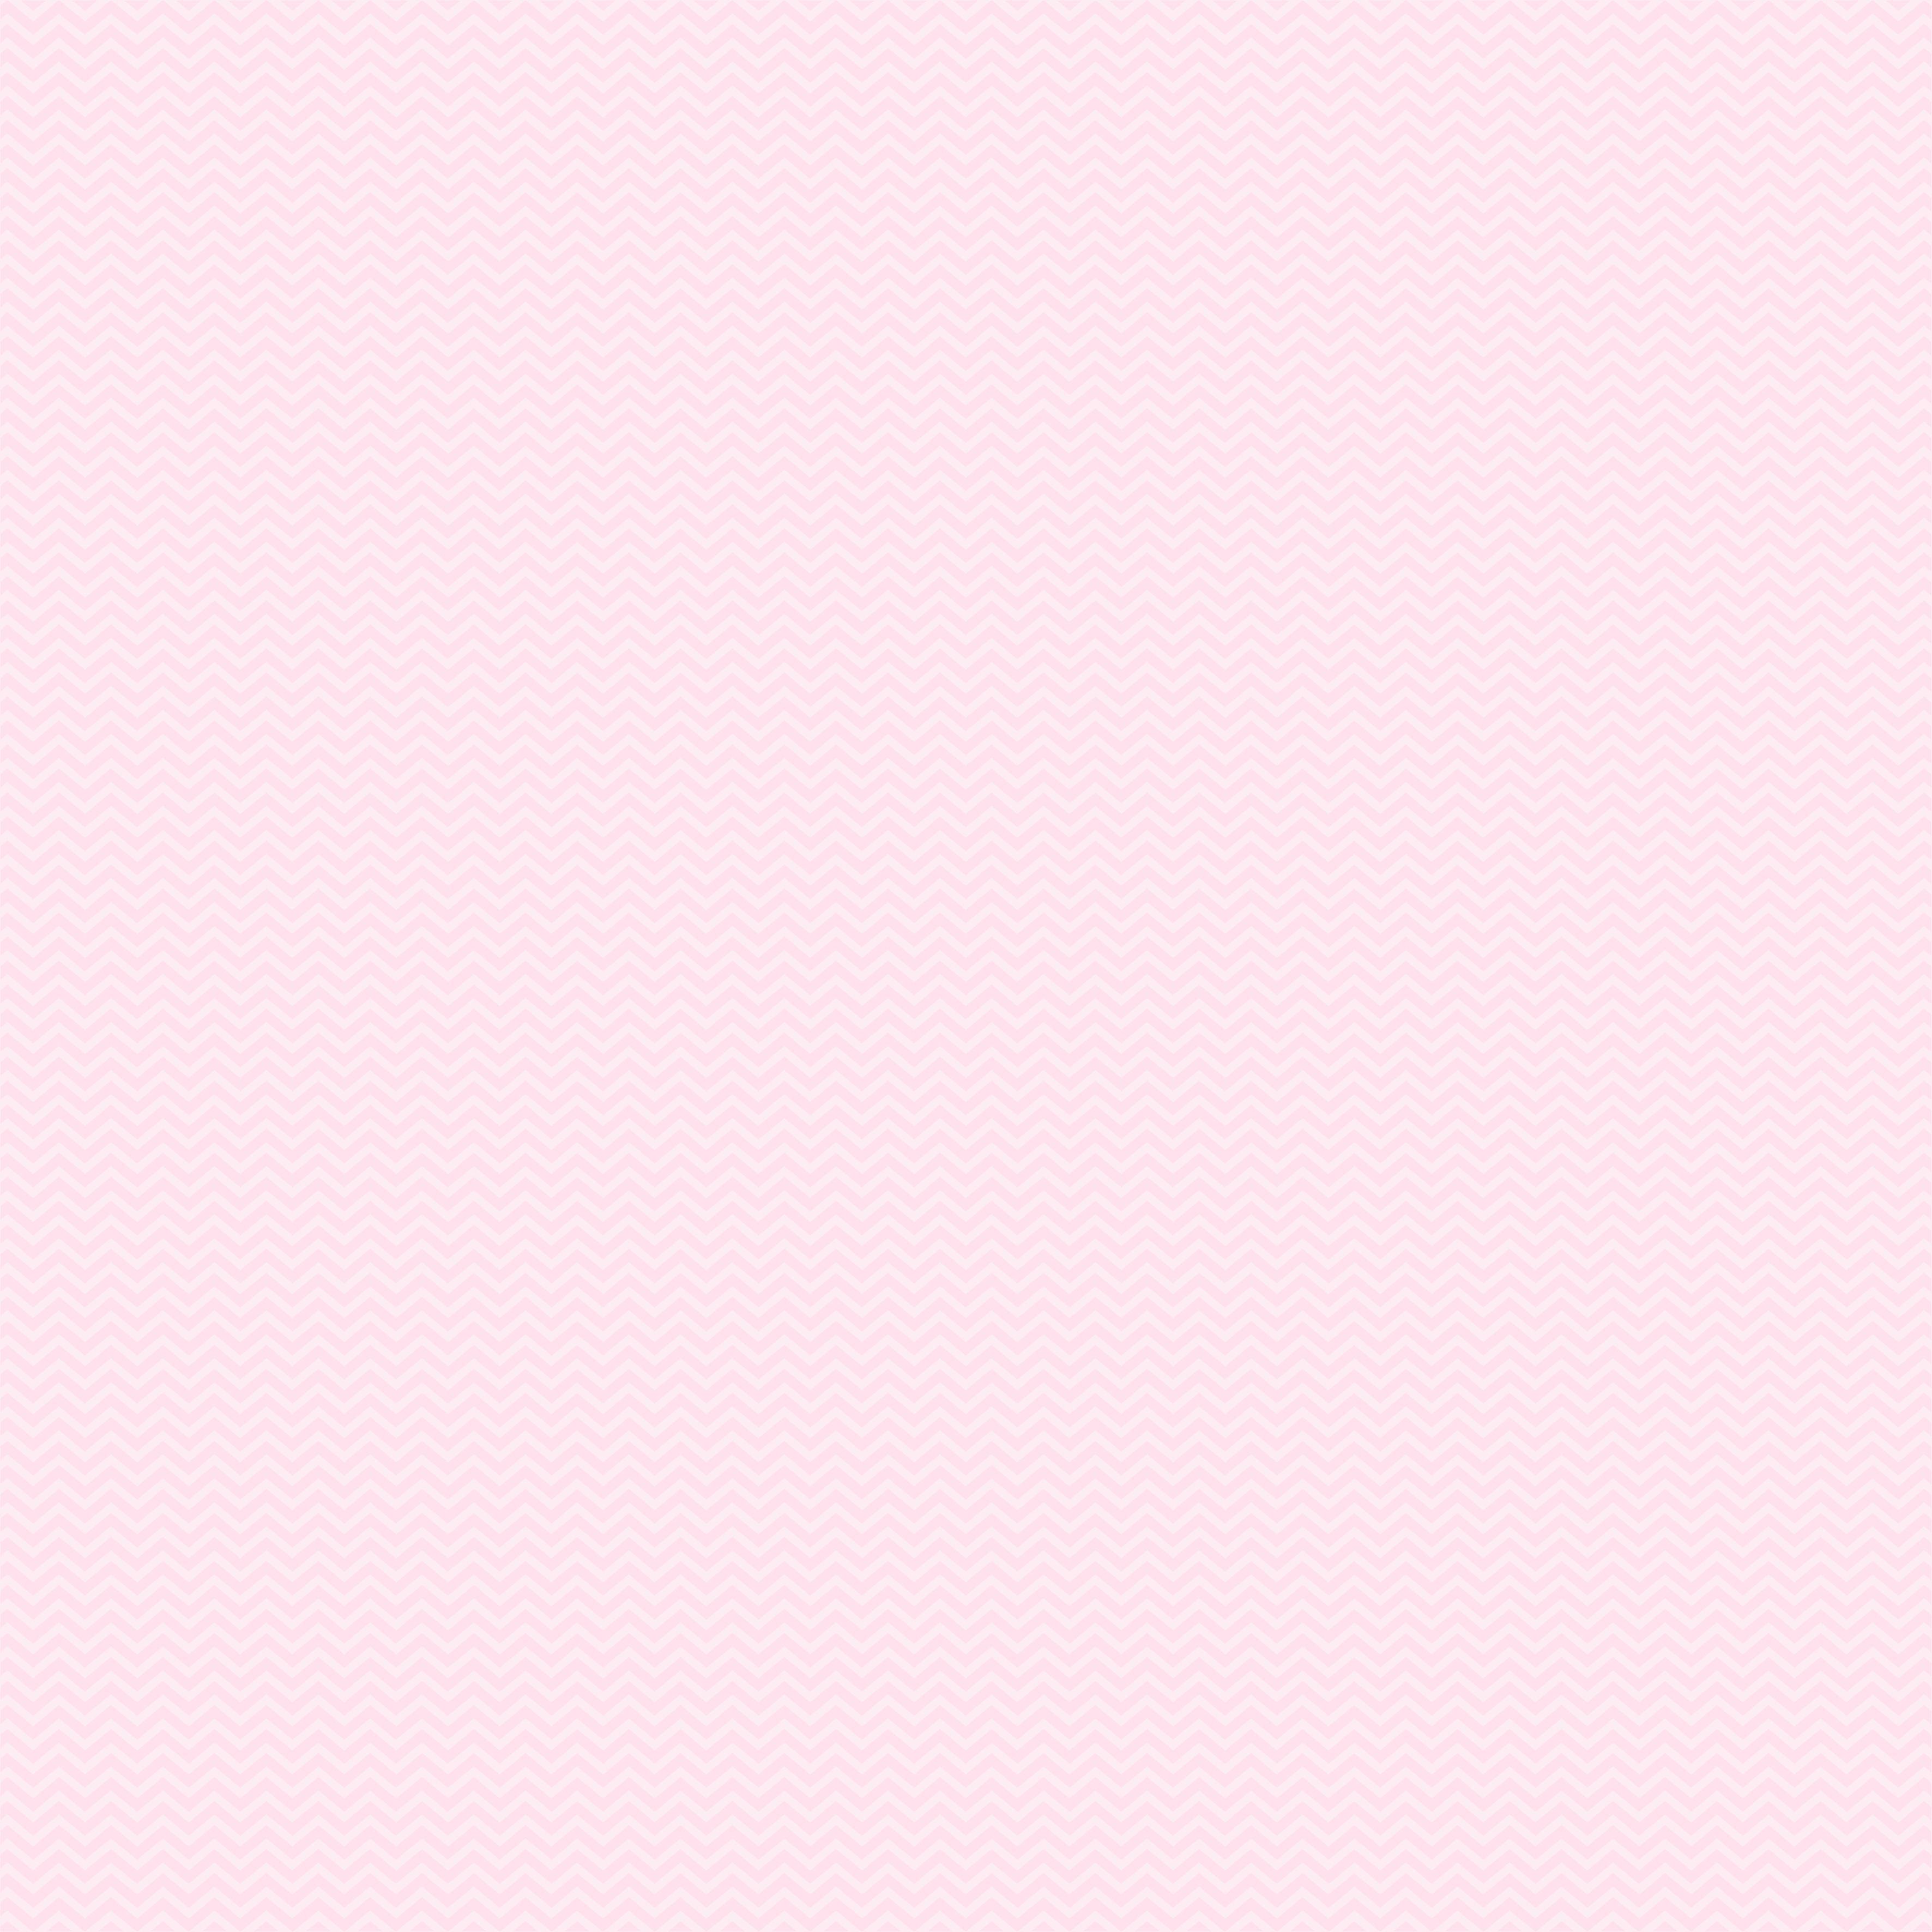 papel digital bailarina rosa 2